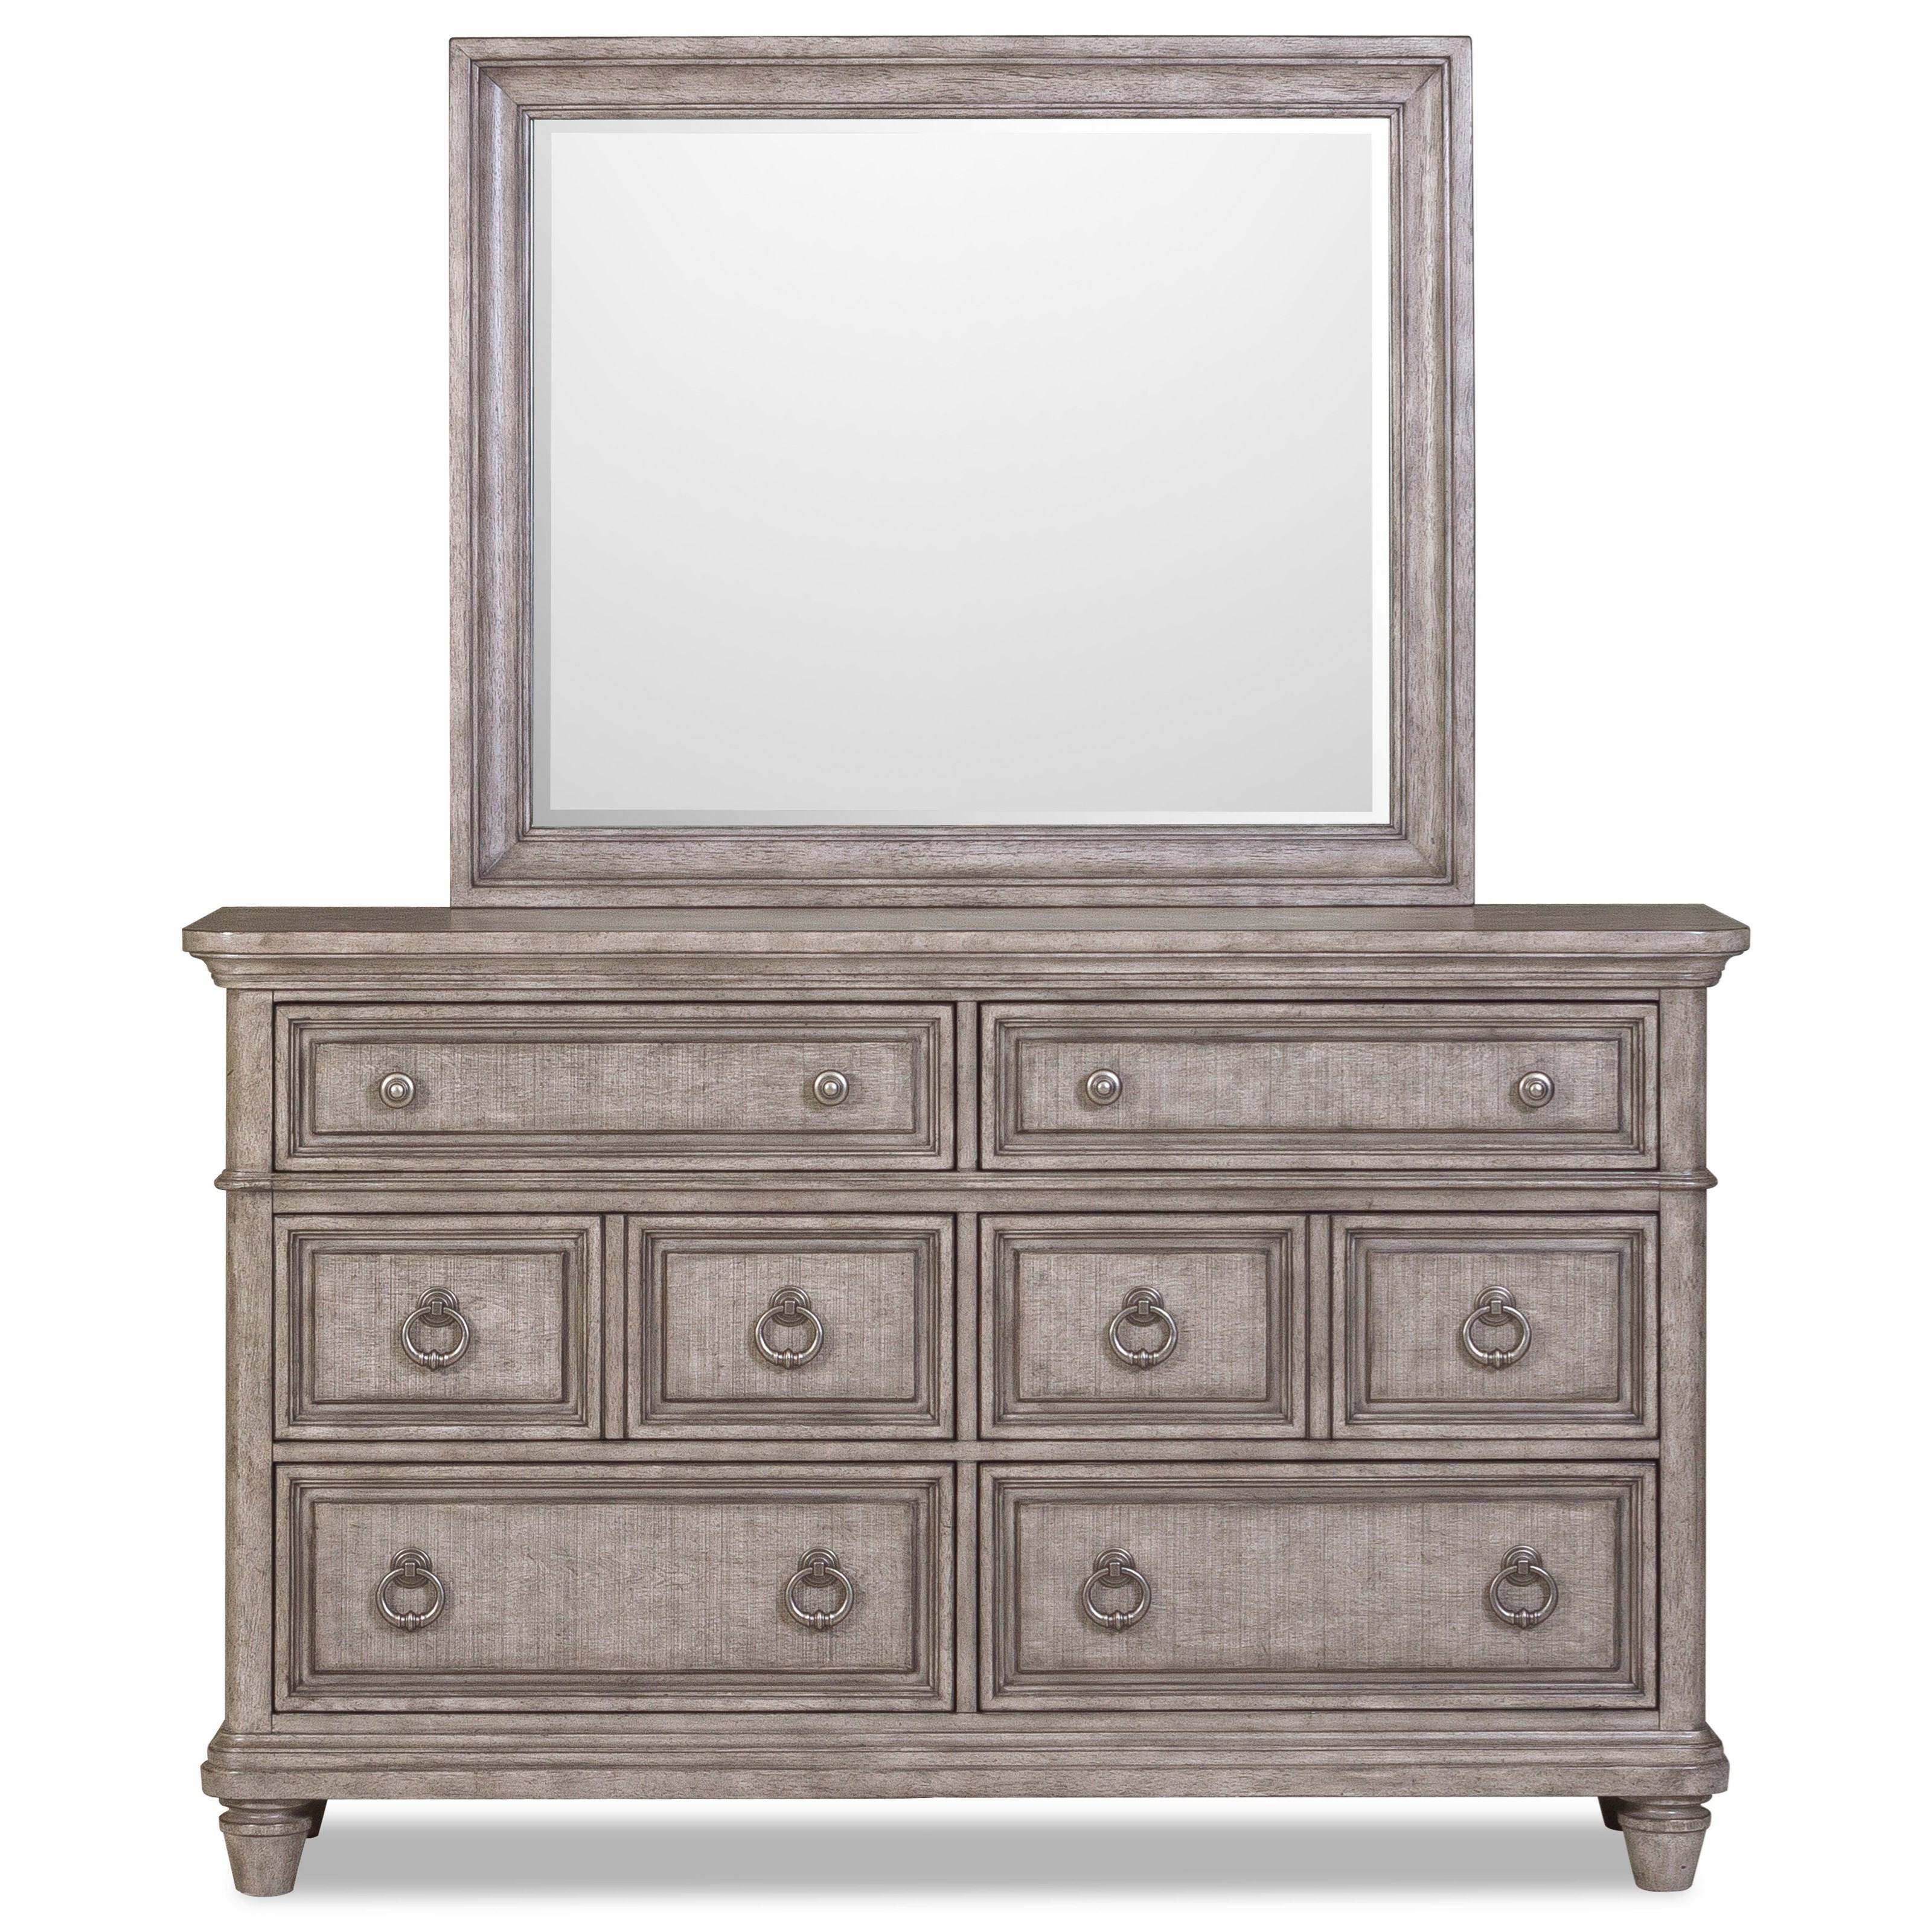 Blakeley Dresser & Mirror by Klaussner International at Northeast Factory Direct